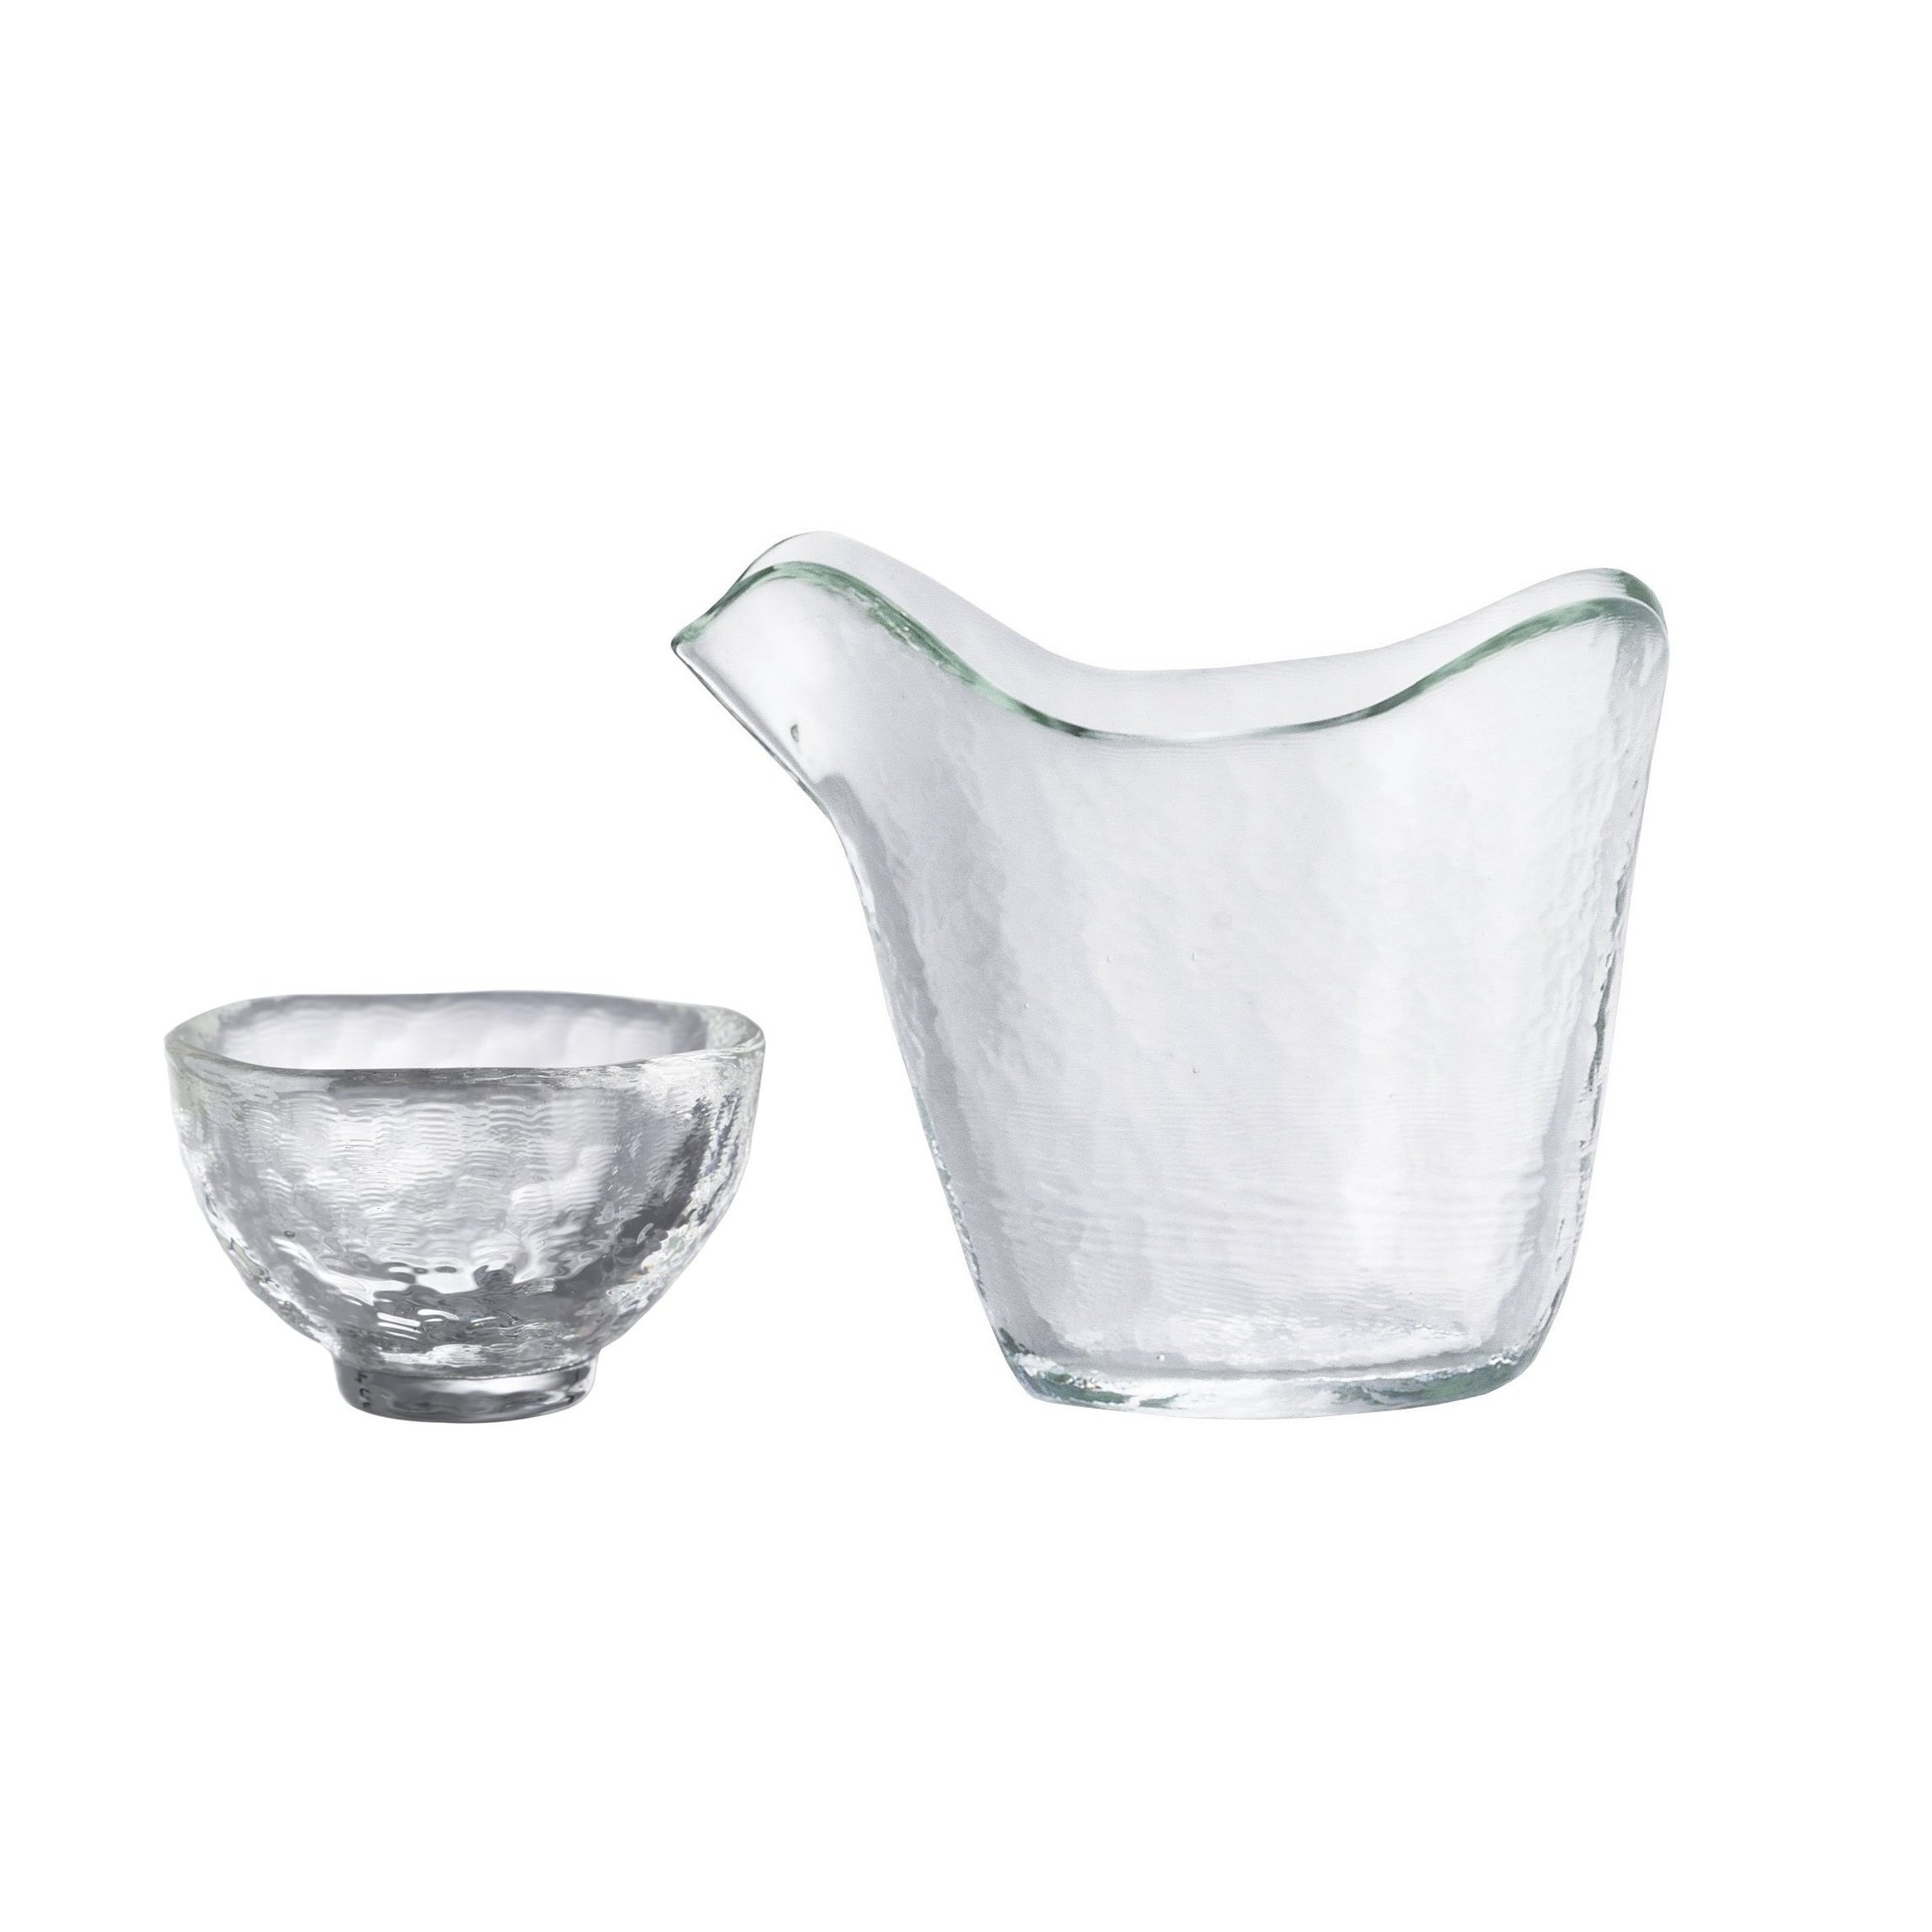 tugaru biidoro Heat-resistant Glass Katakuchi Sake Set